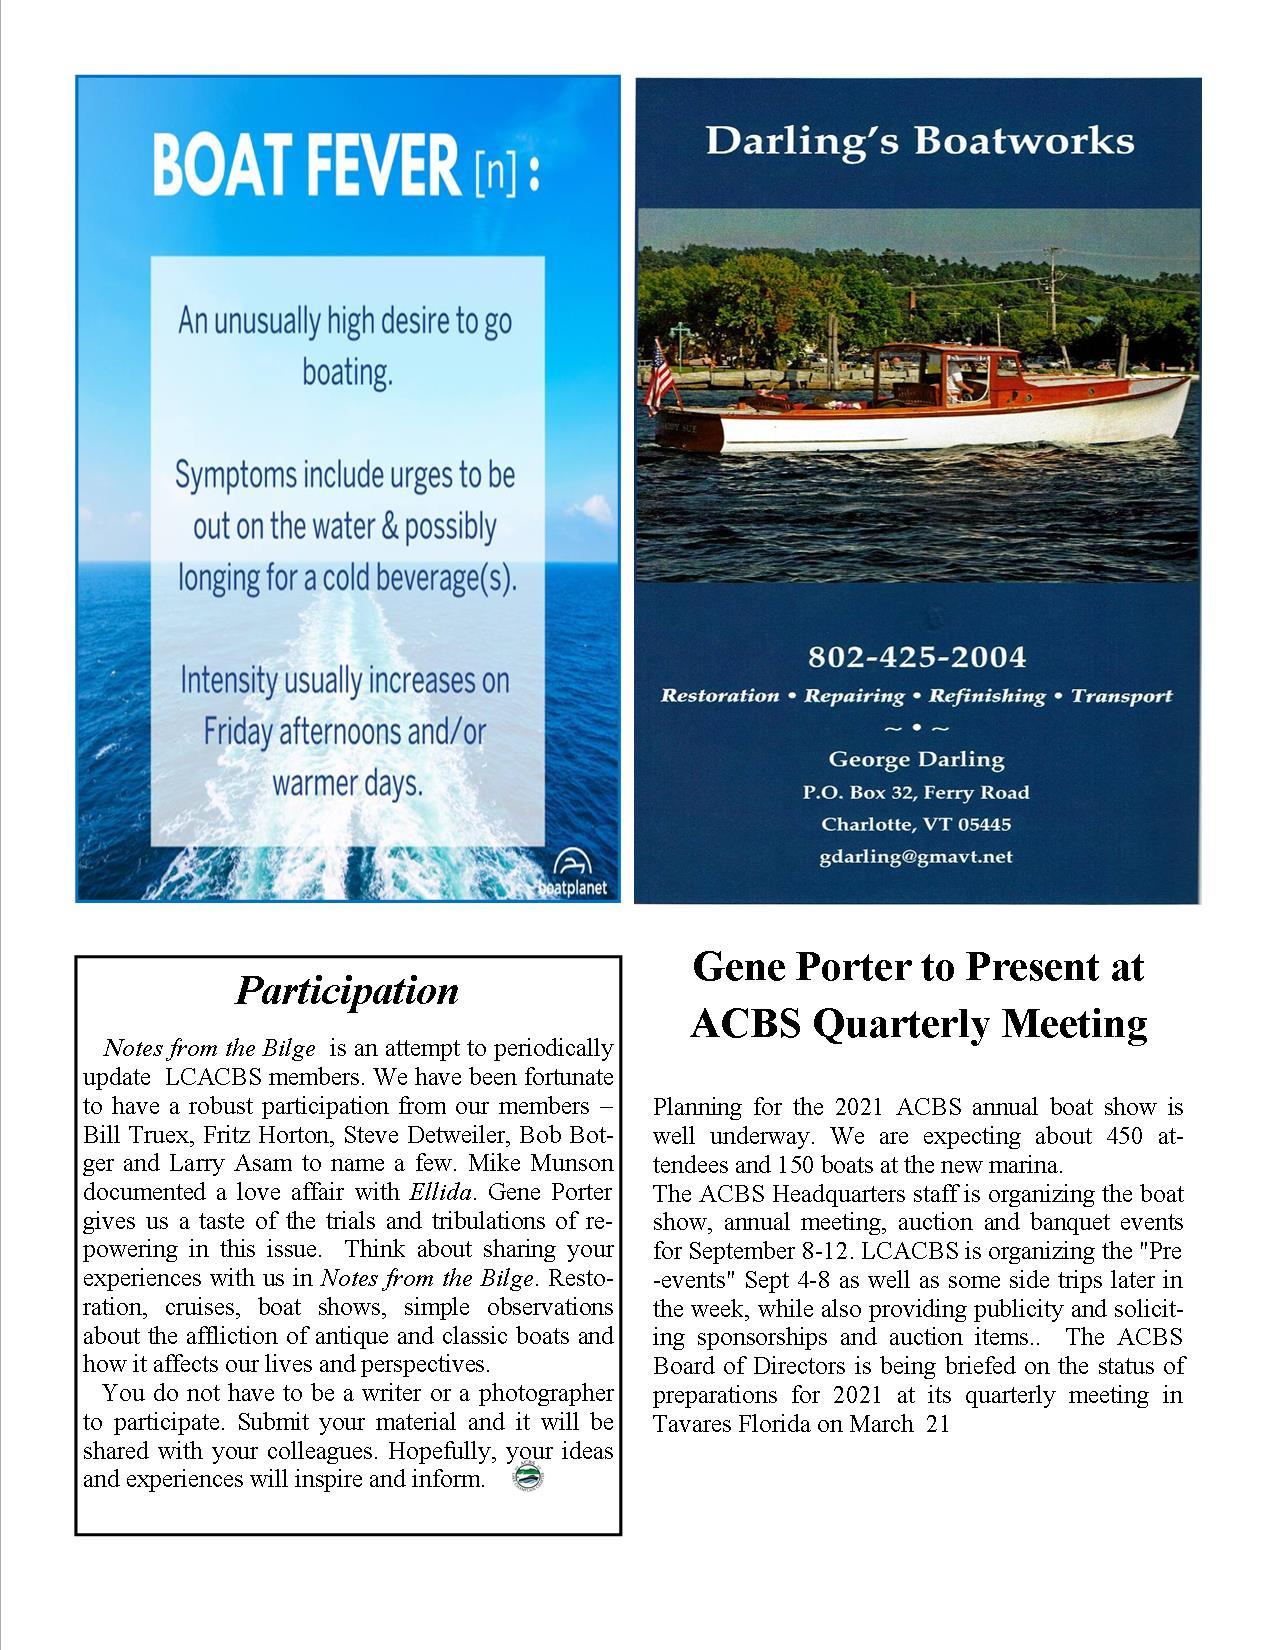 LCACBS Newletter 3.1.19 6.jpg